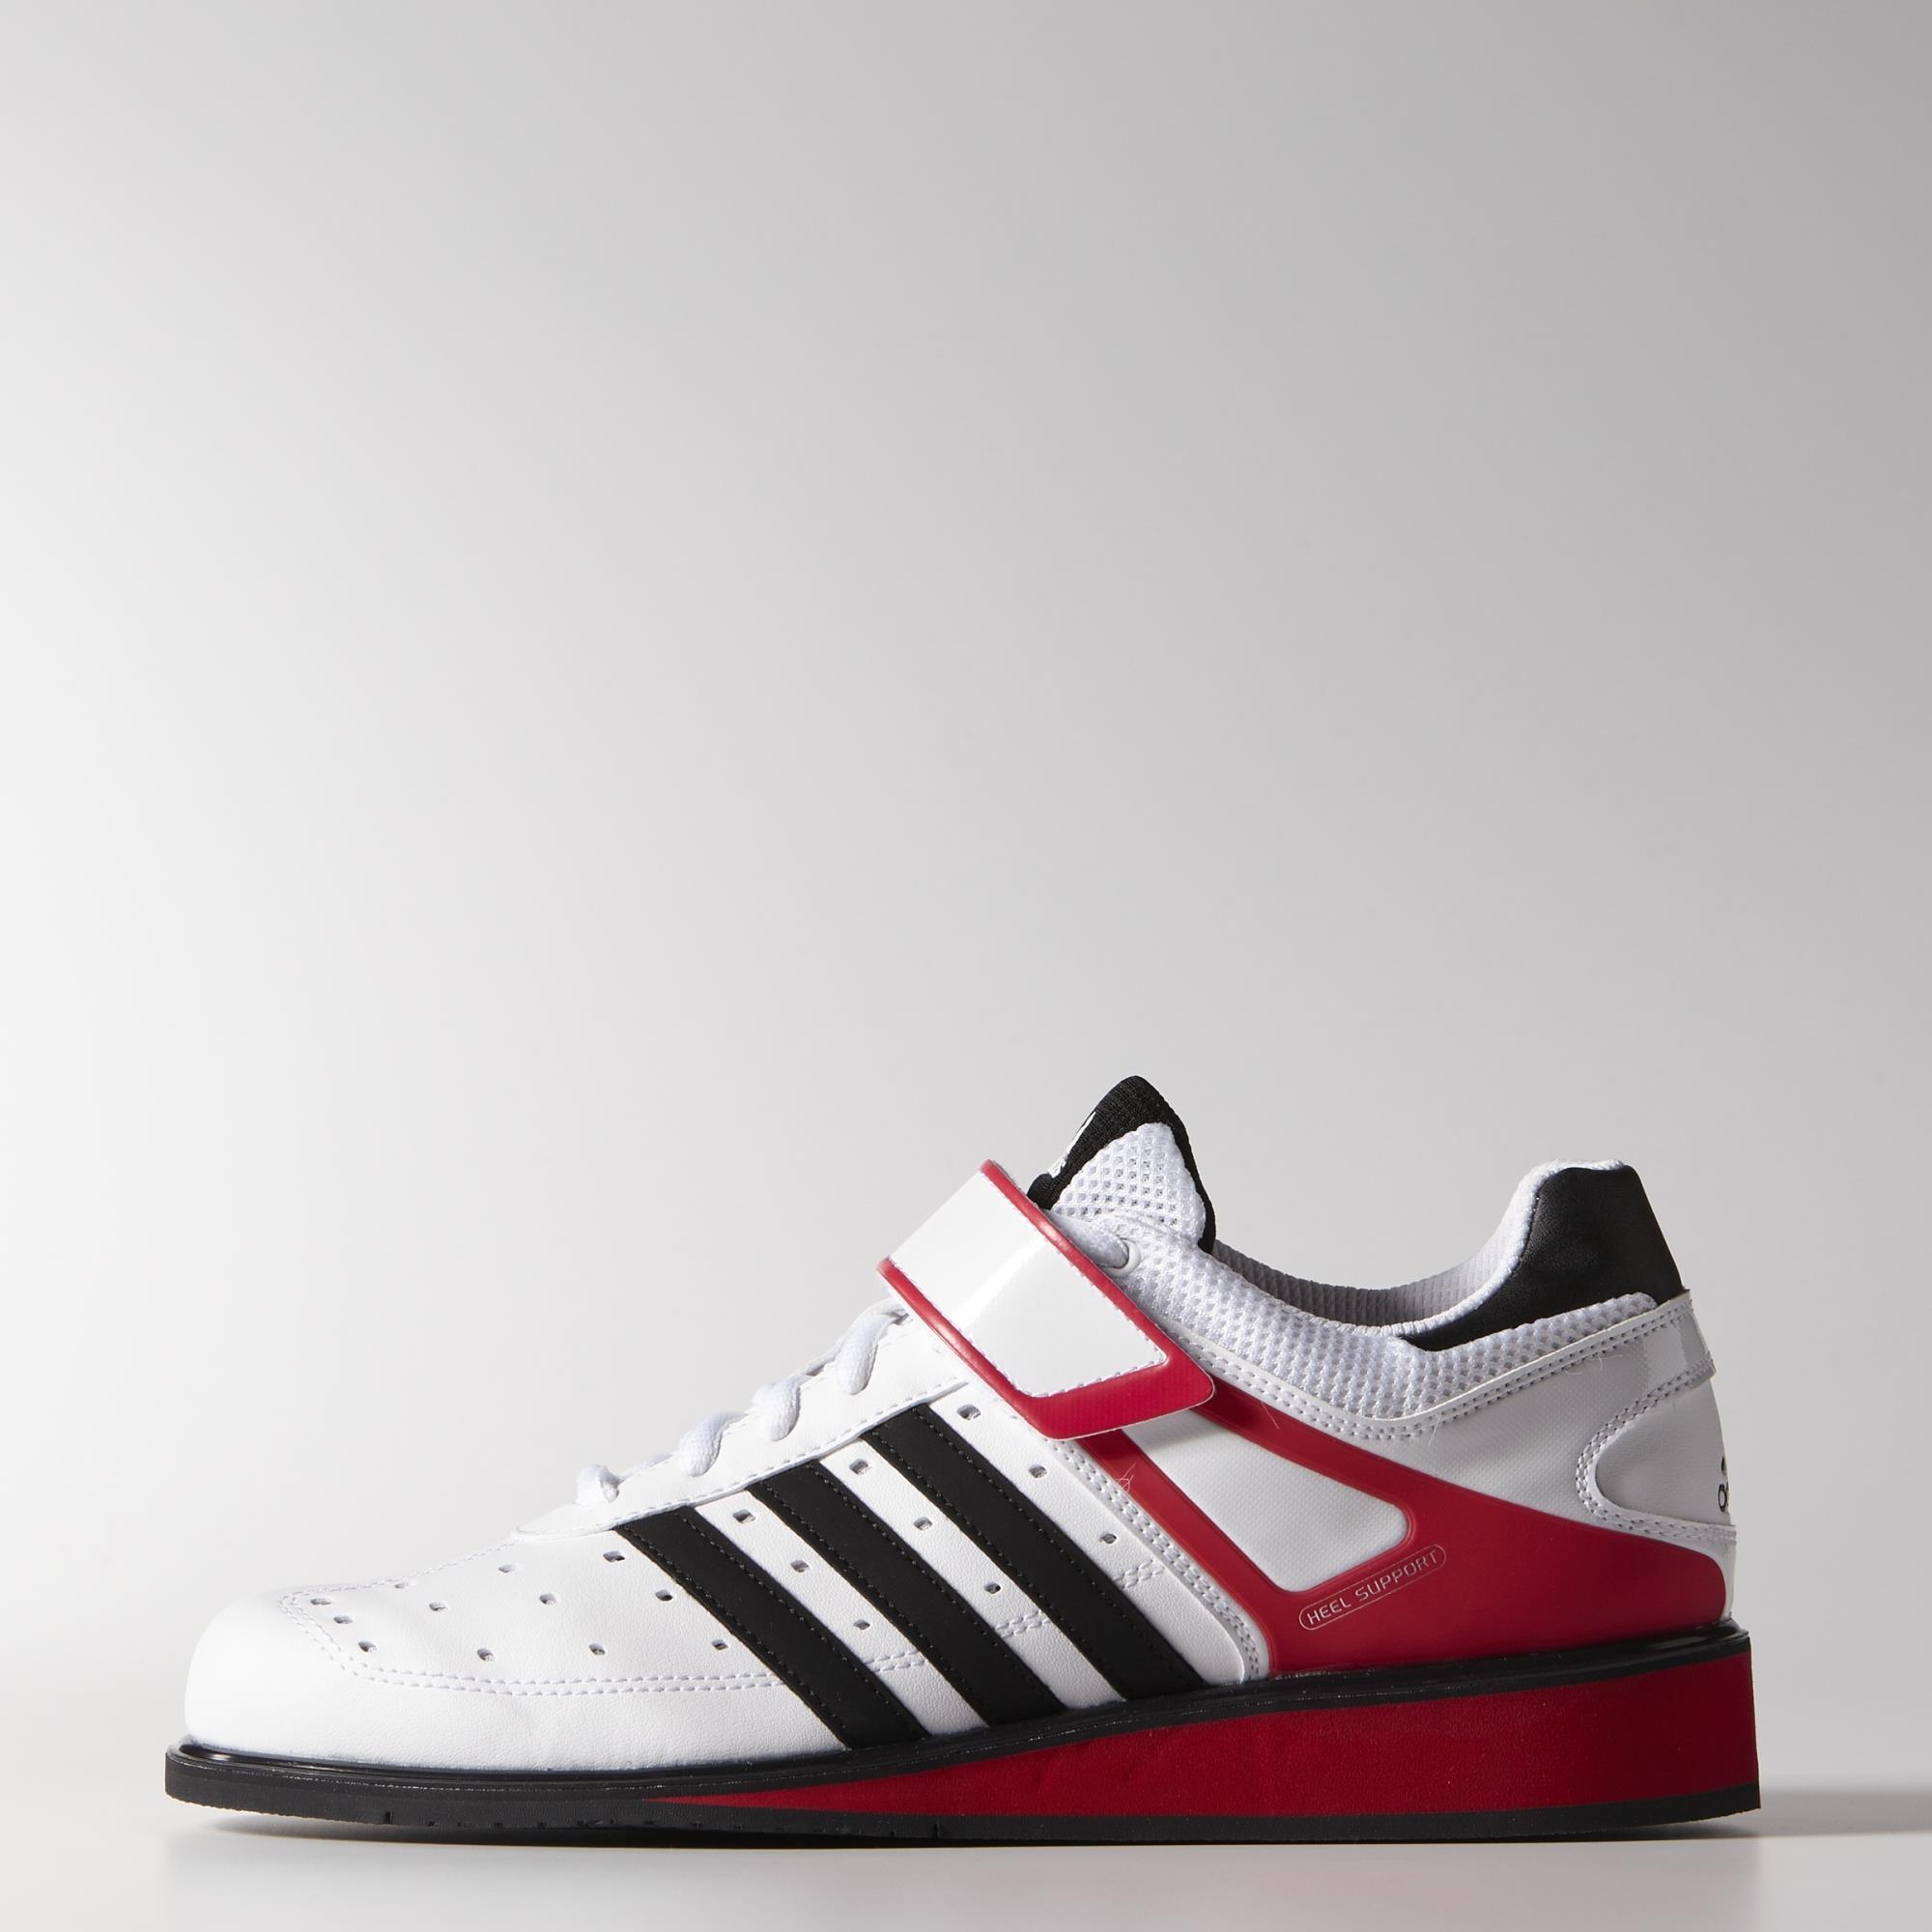 adidas power perfect 2.0